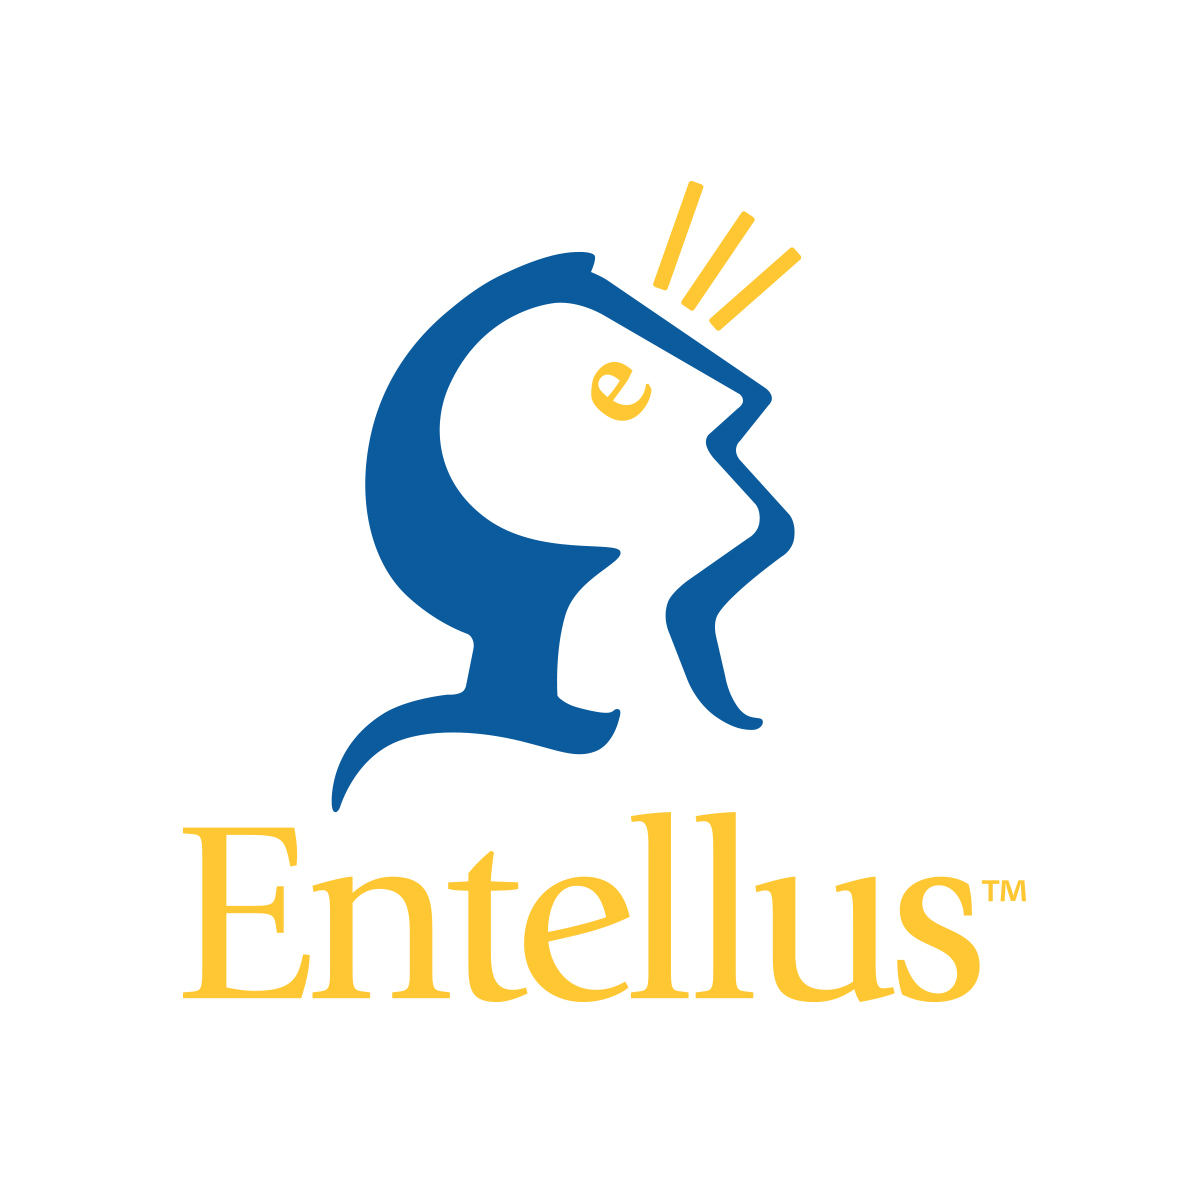 Entellus logo.jpg